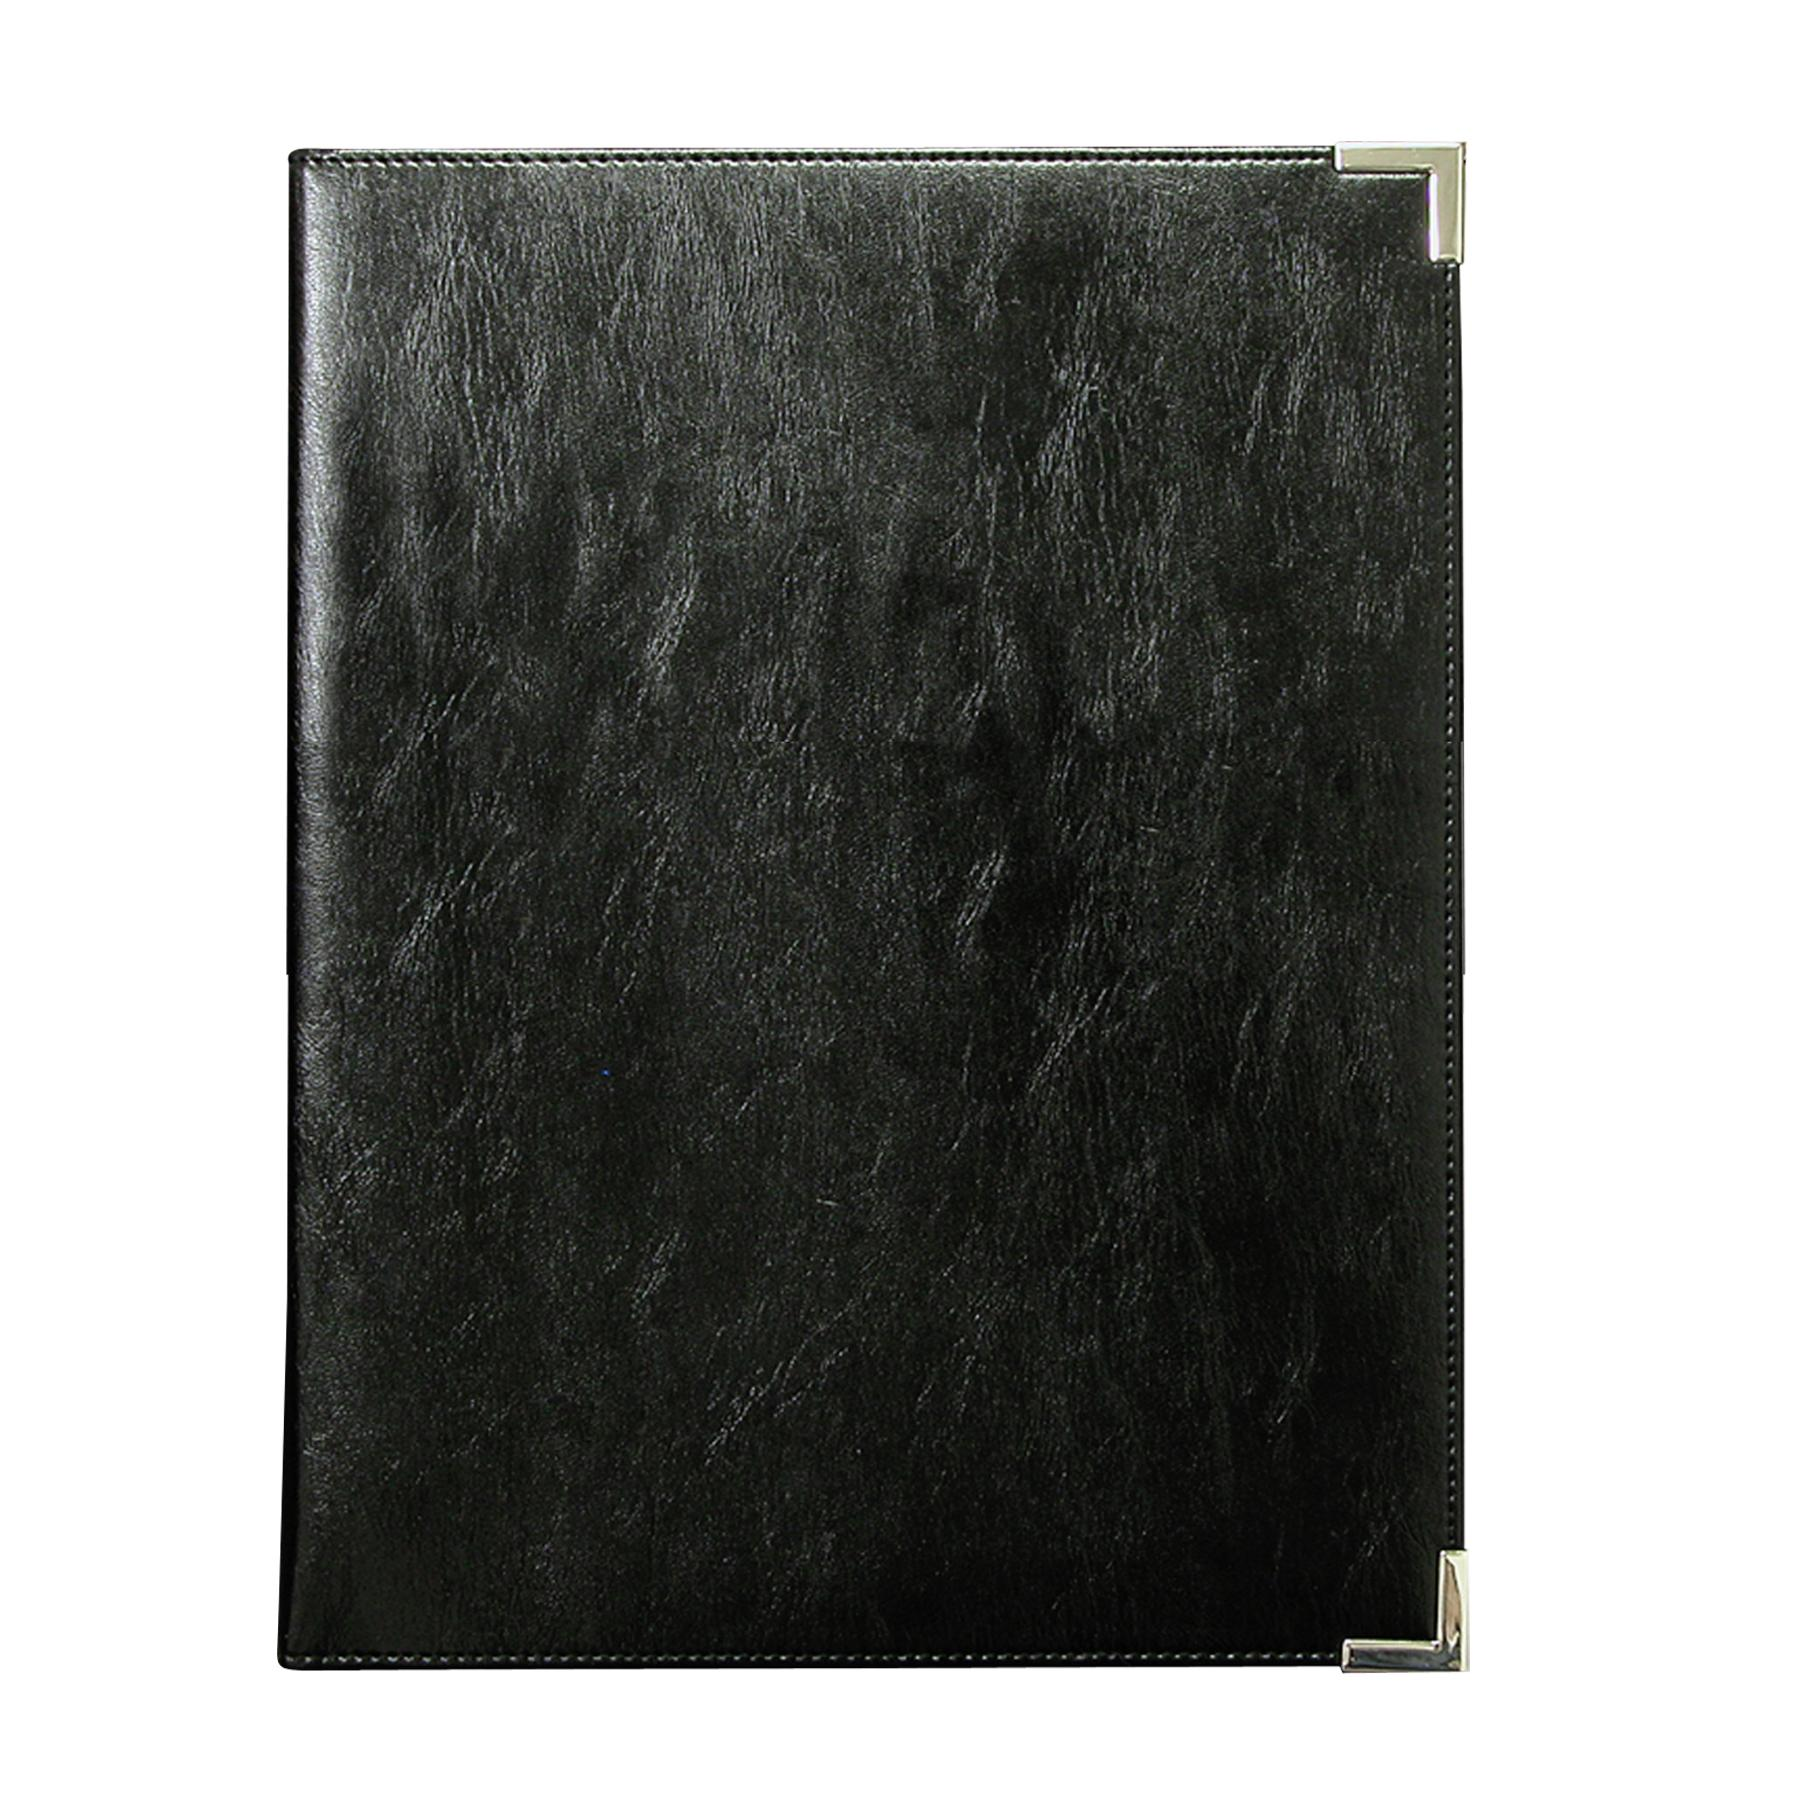 Buxton Black Writing Pad